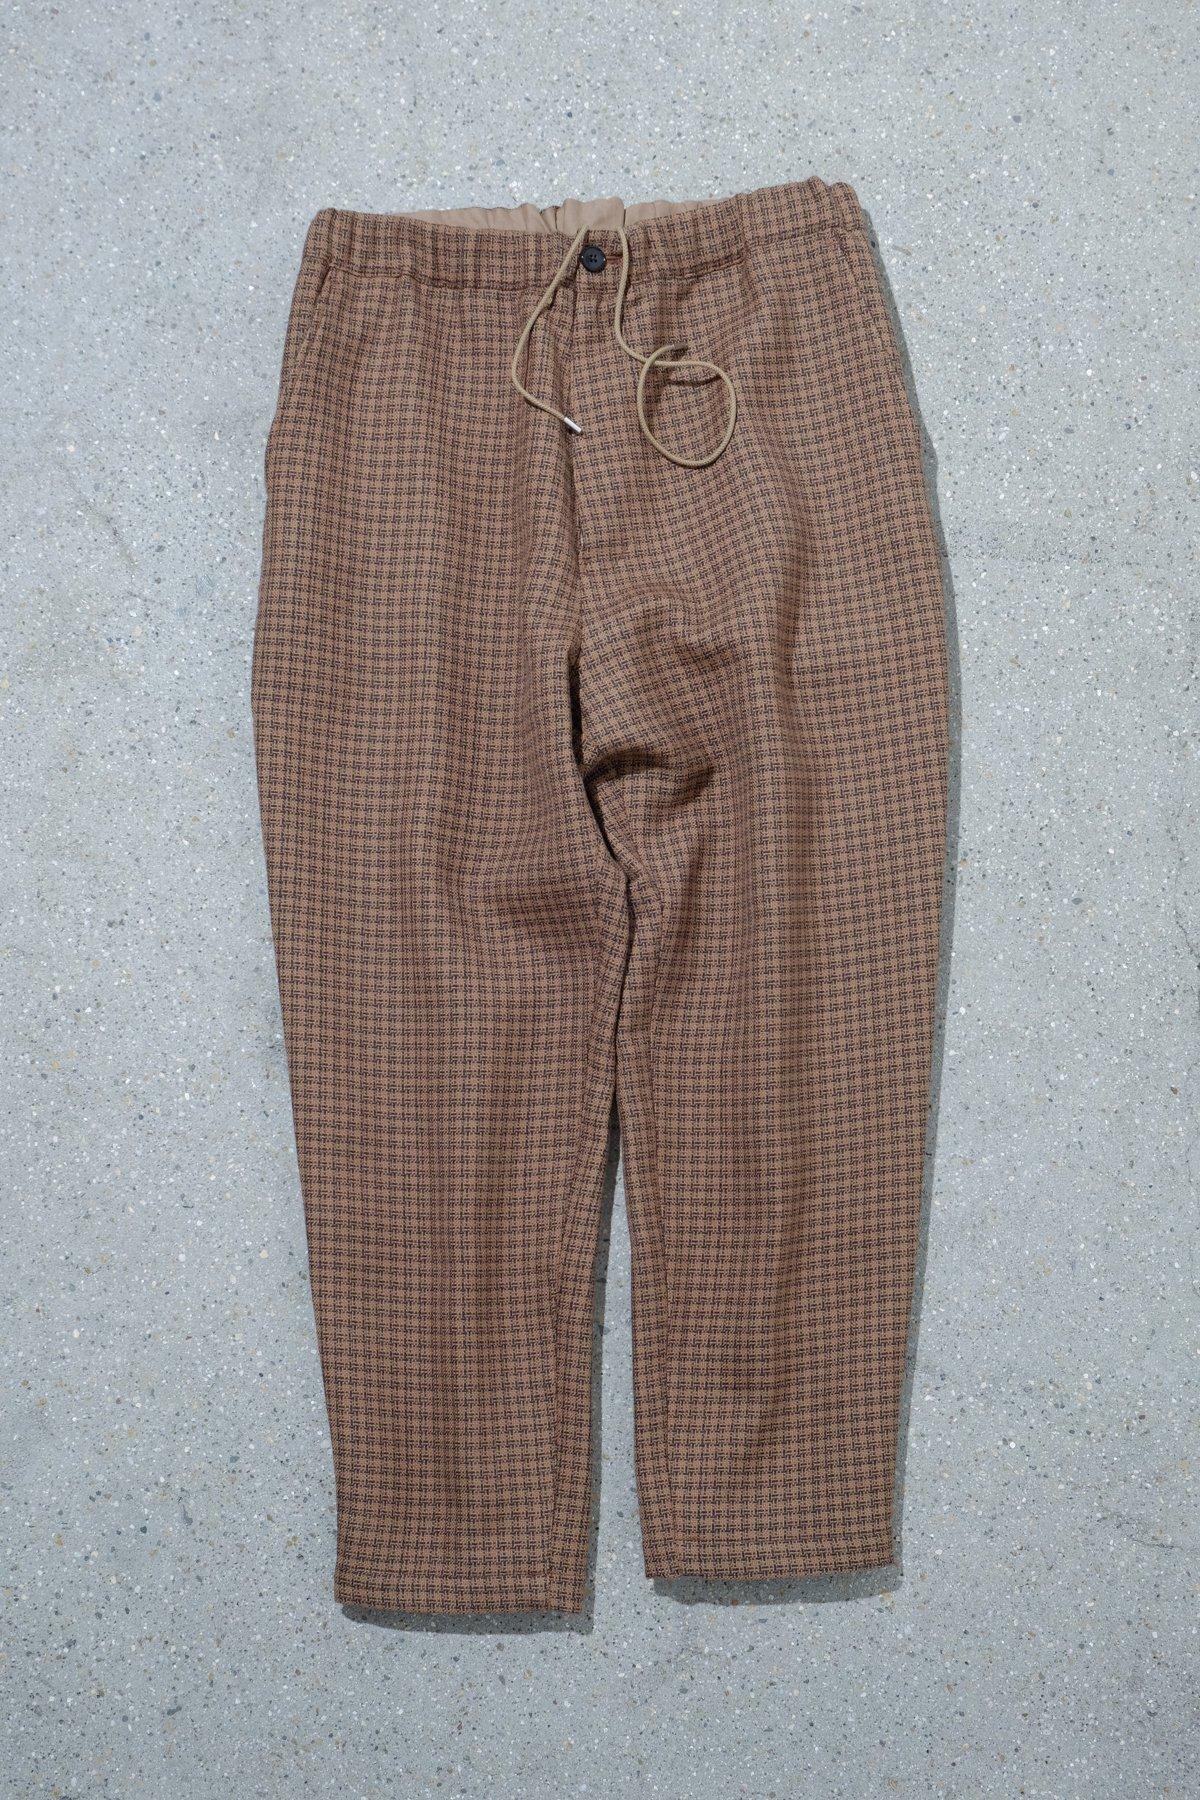 WELLDER / Drawstring Easy Trousers